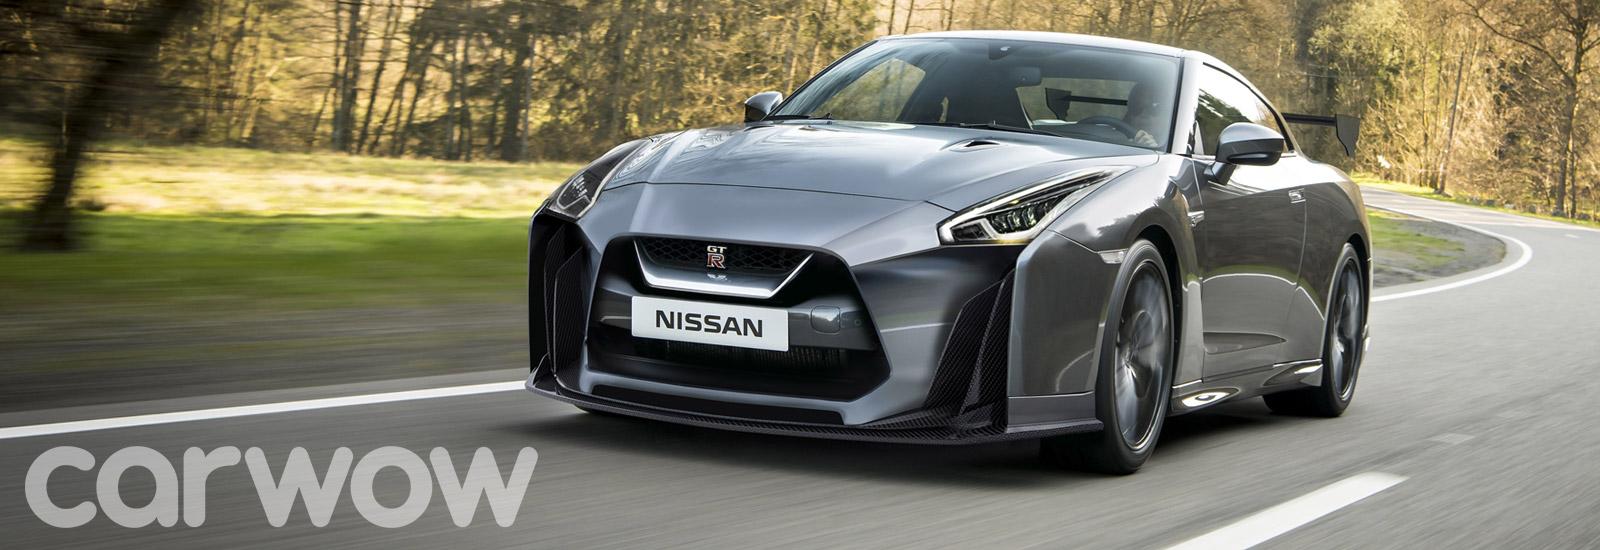 Nissan GT-R R36 Styling